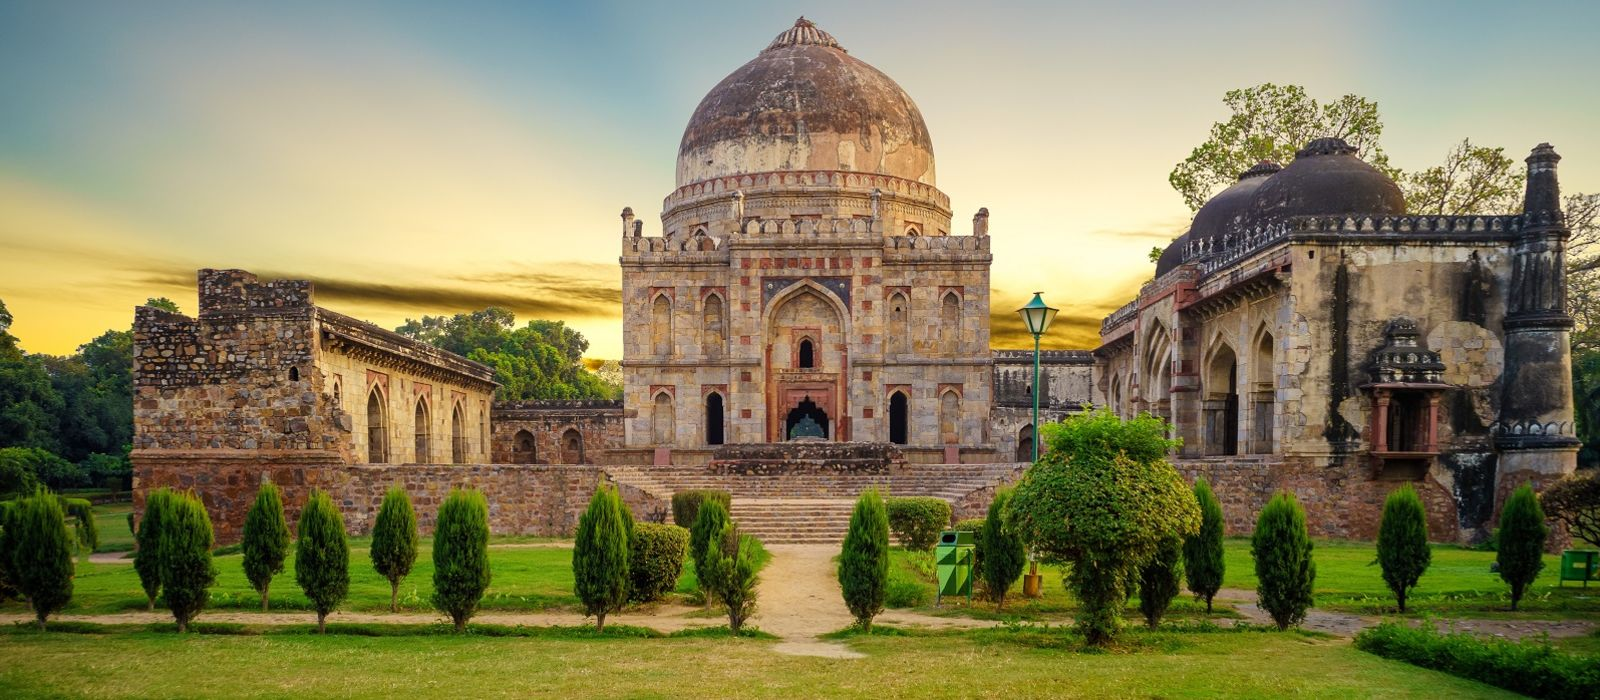 Taj Special: Tiger Trails of India Tour Trip 5